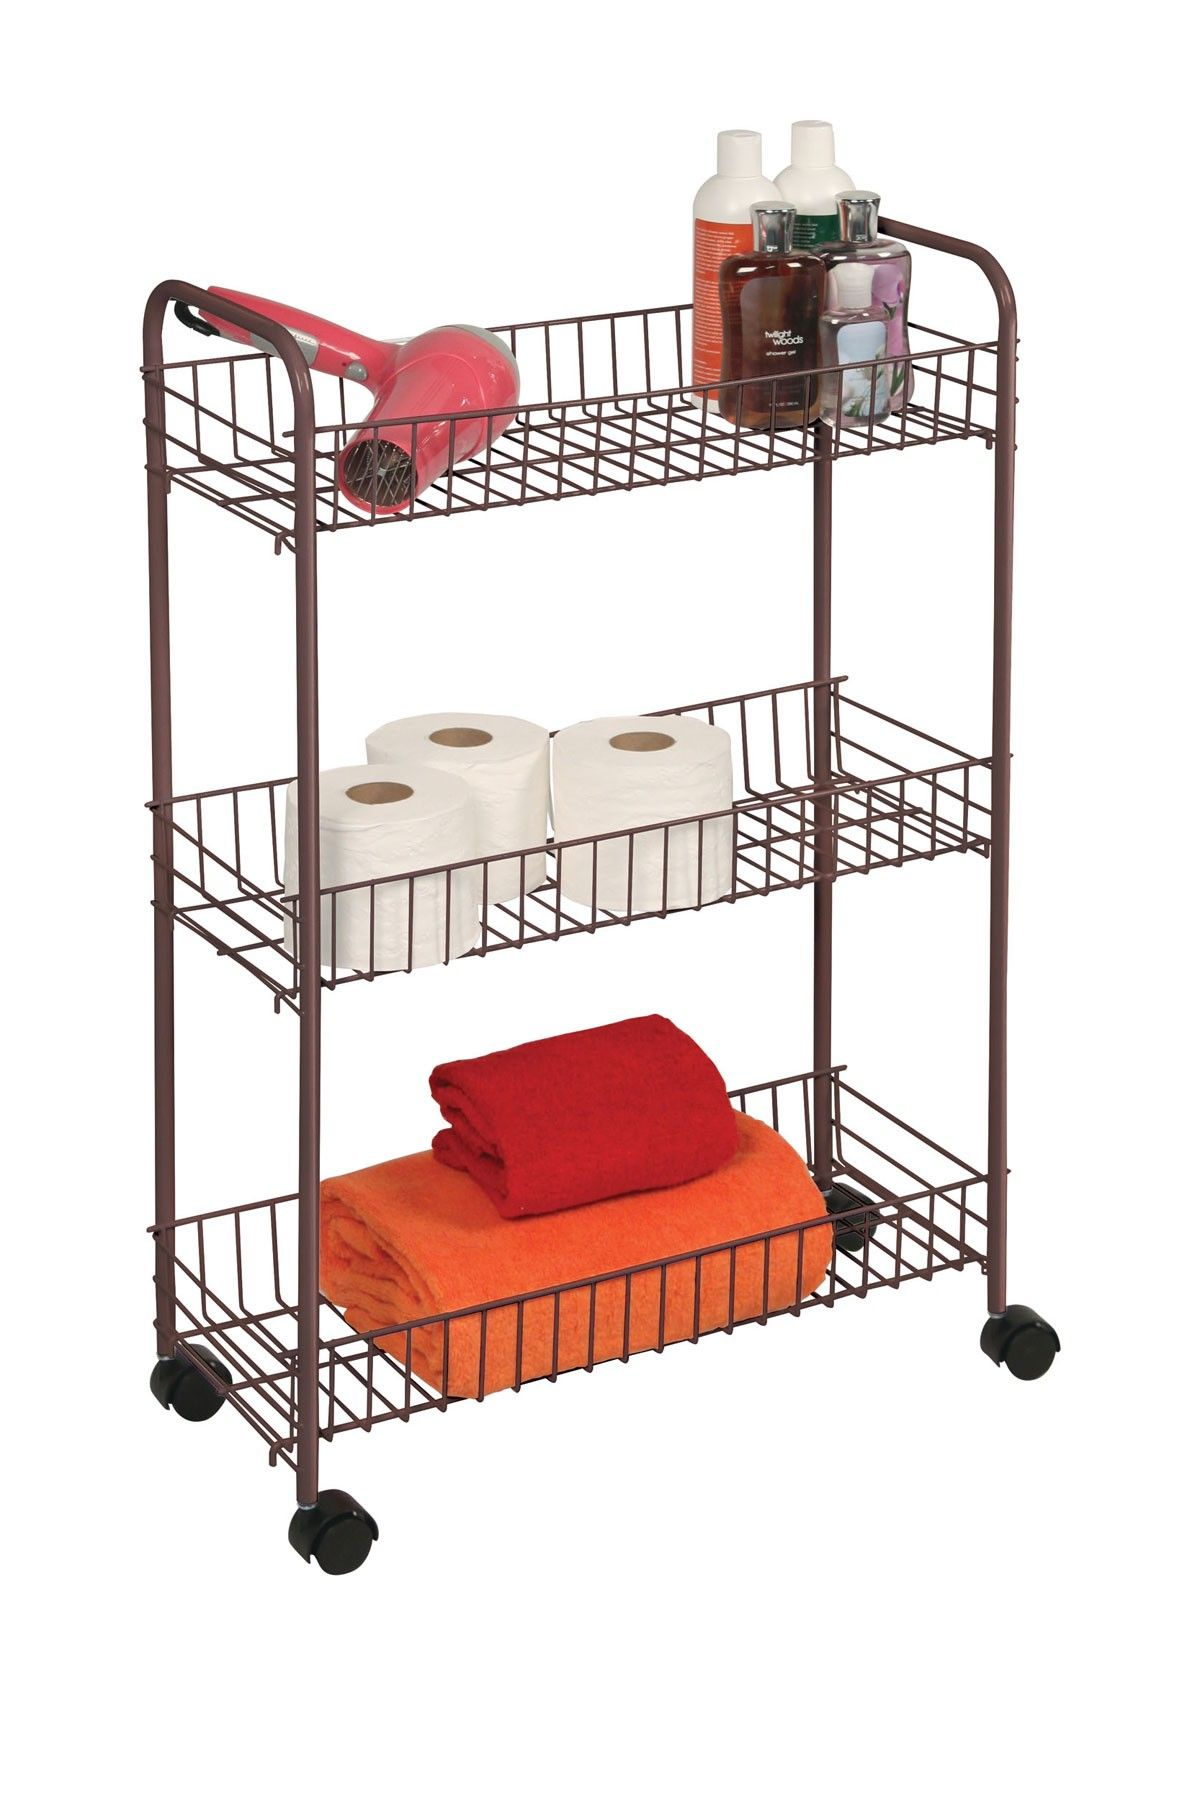 Richards 3Tier Medium Bronze Rolling Cart  Home Design  Pinterest Captivating Small Bathroom Cart Design Ideas